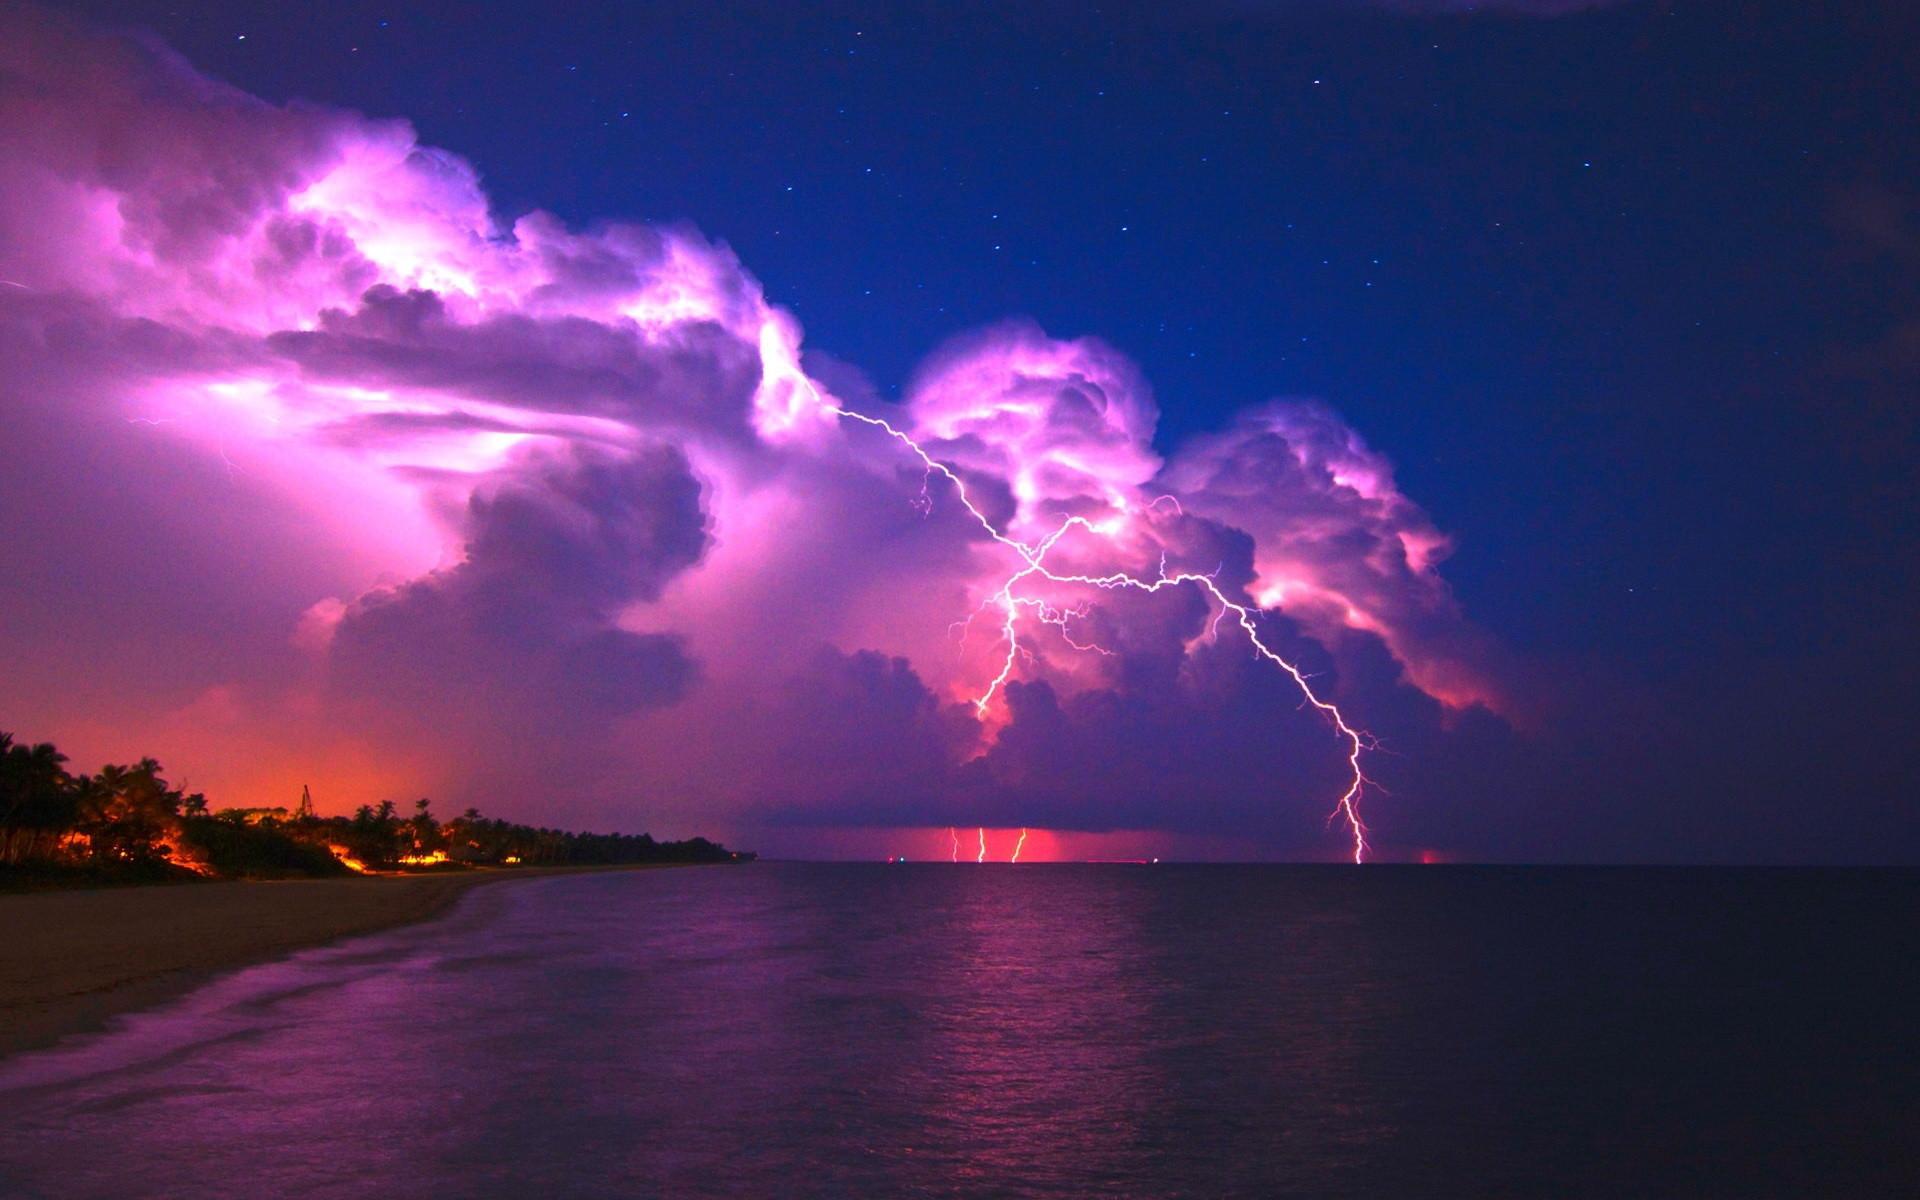 Thunderstorm night HD Wallpaper   Wallpapers   Pinterest   Thunderstorms  and Hd wallpaper